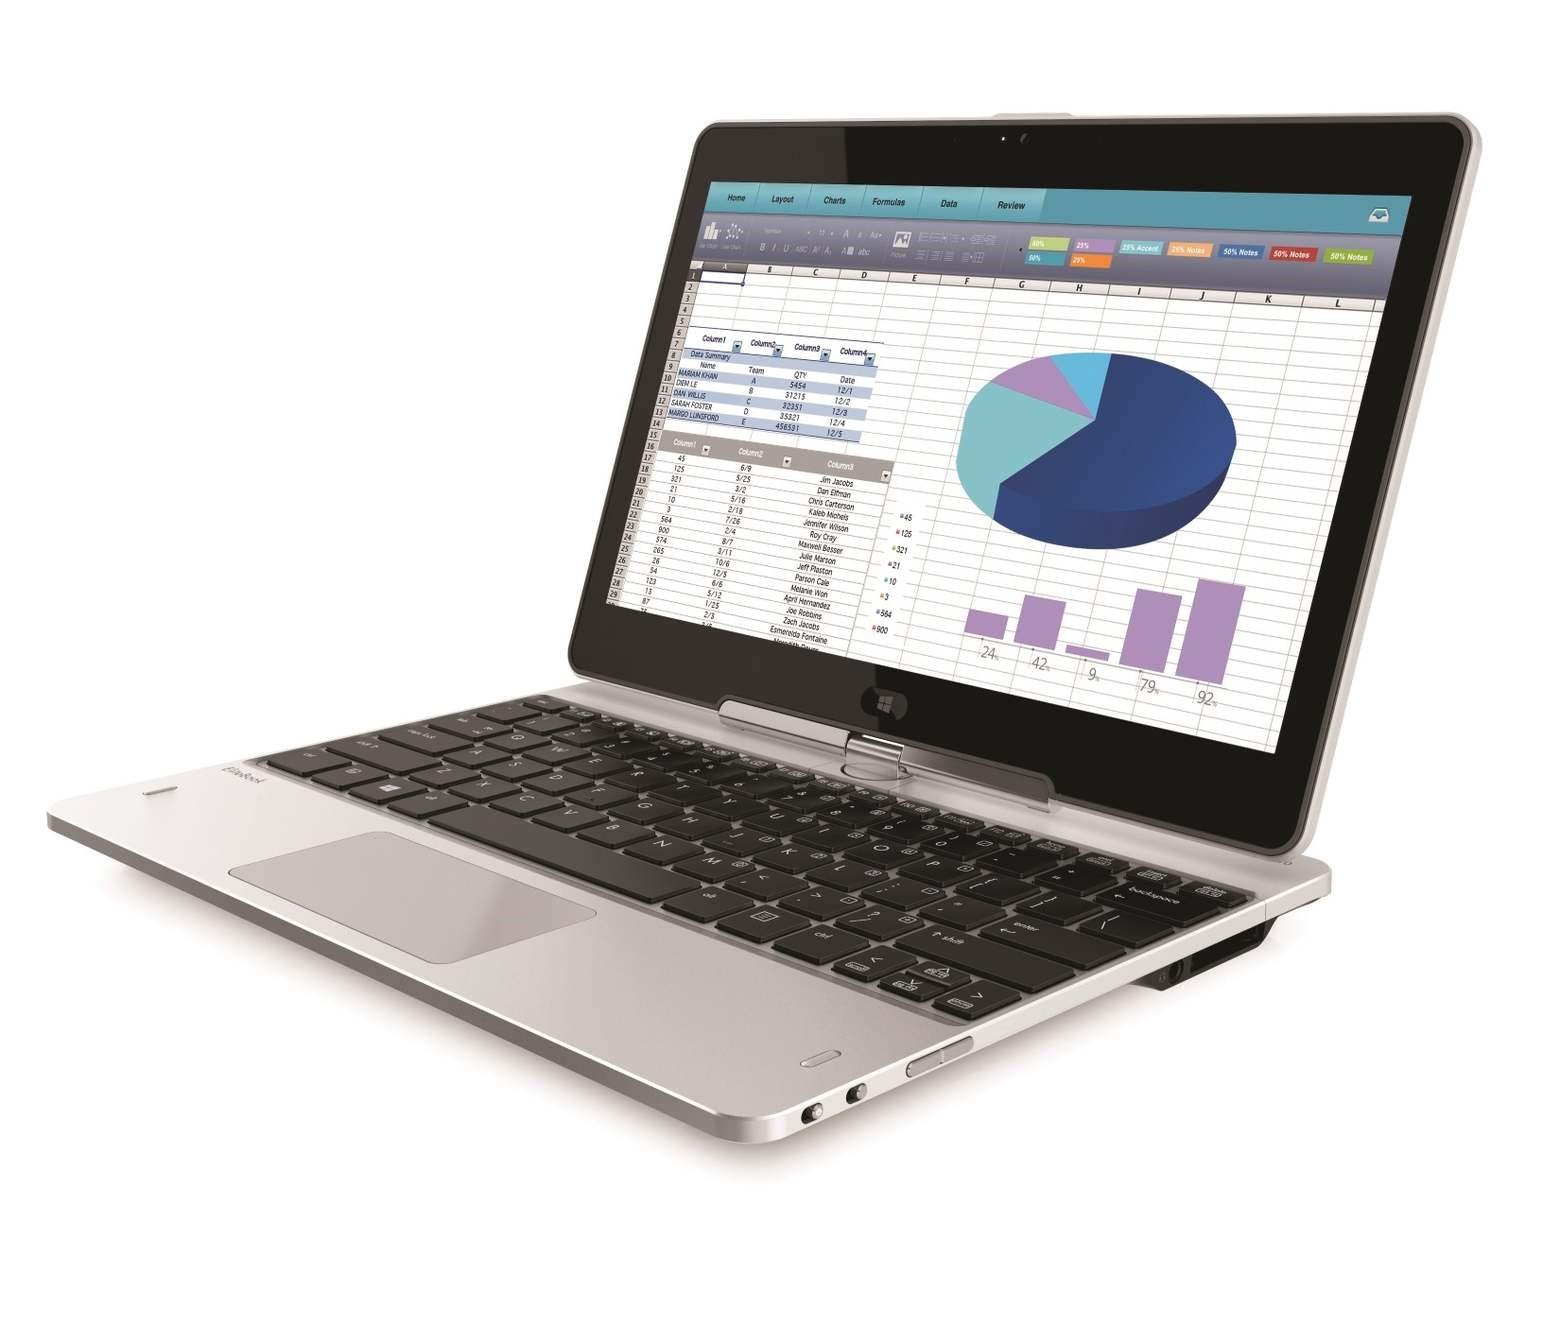 HPEliteBook Revolve 810 G3